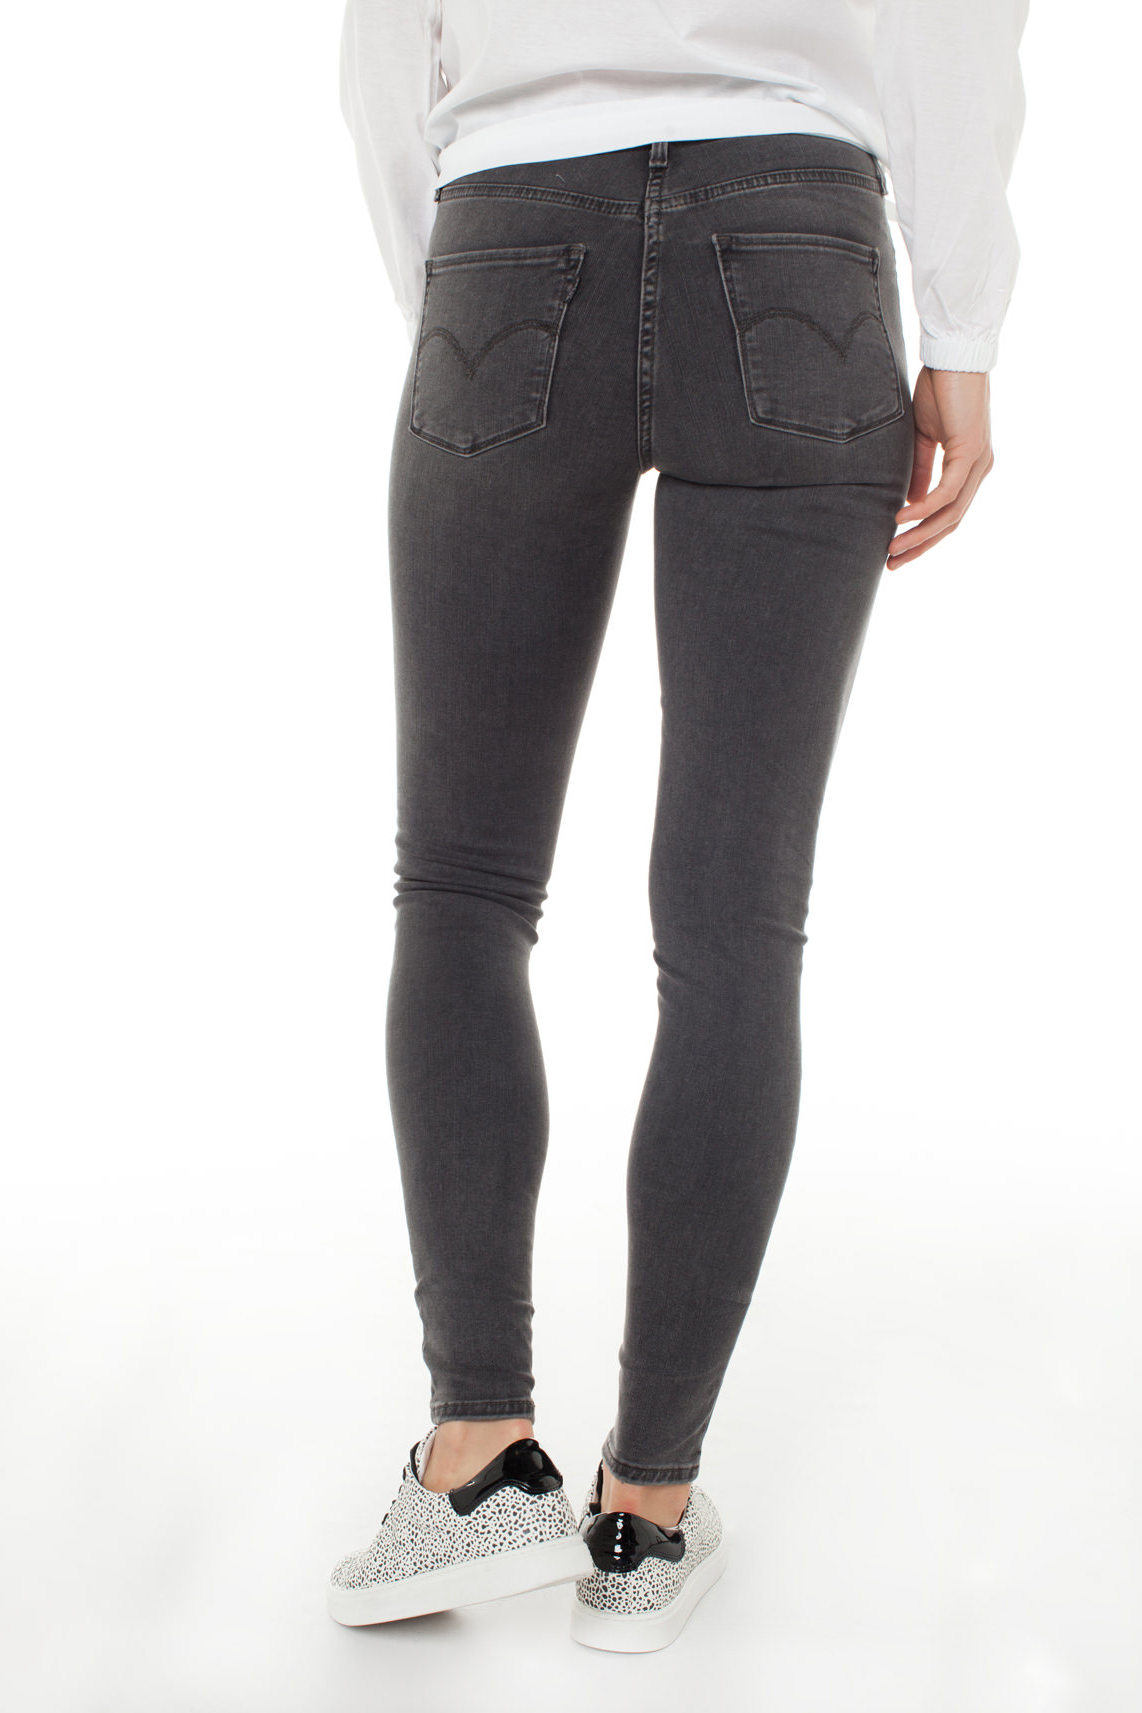 Levi s Dames 310 Shaping skinny jeans L32 Grijs